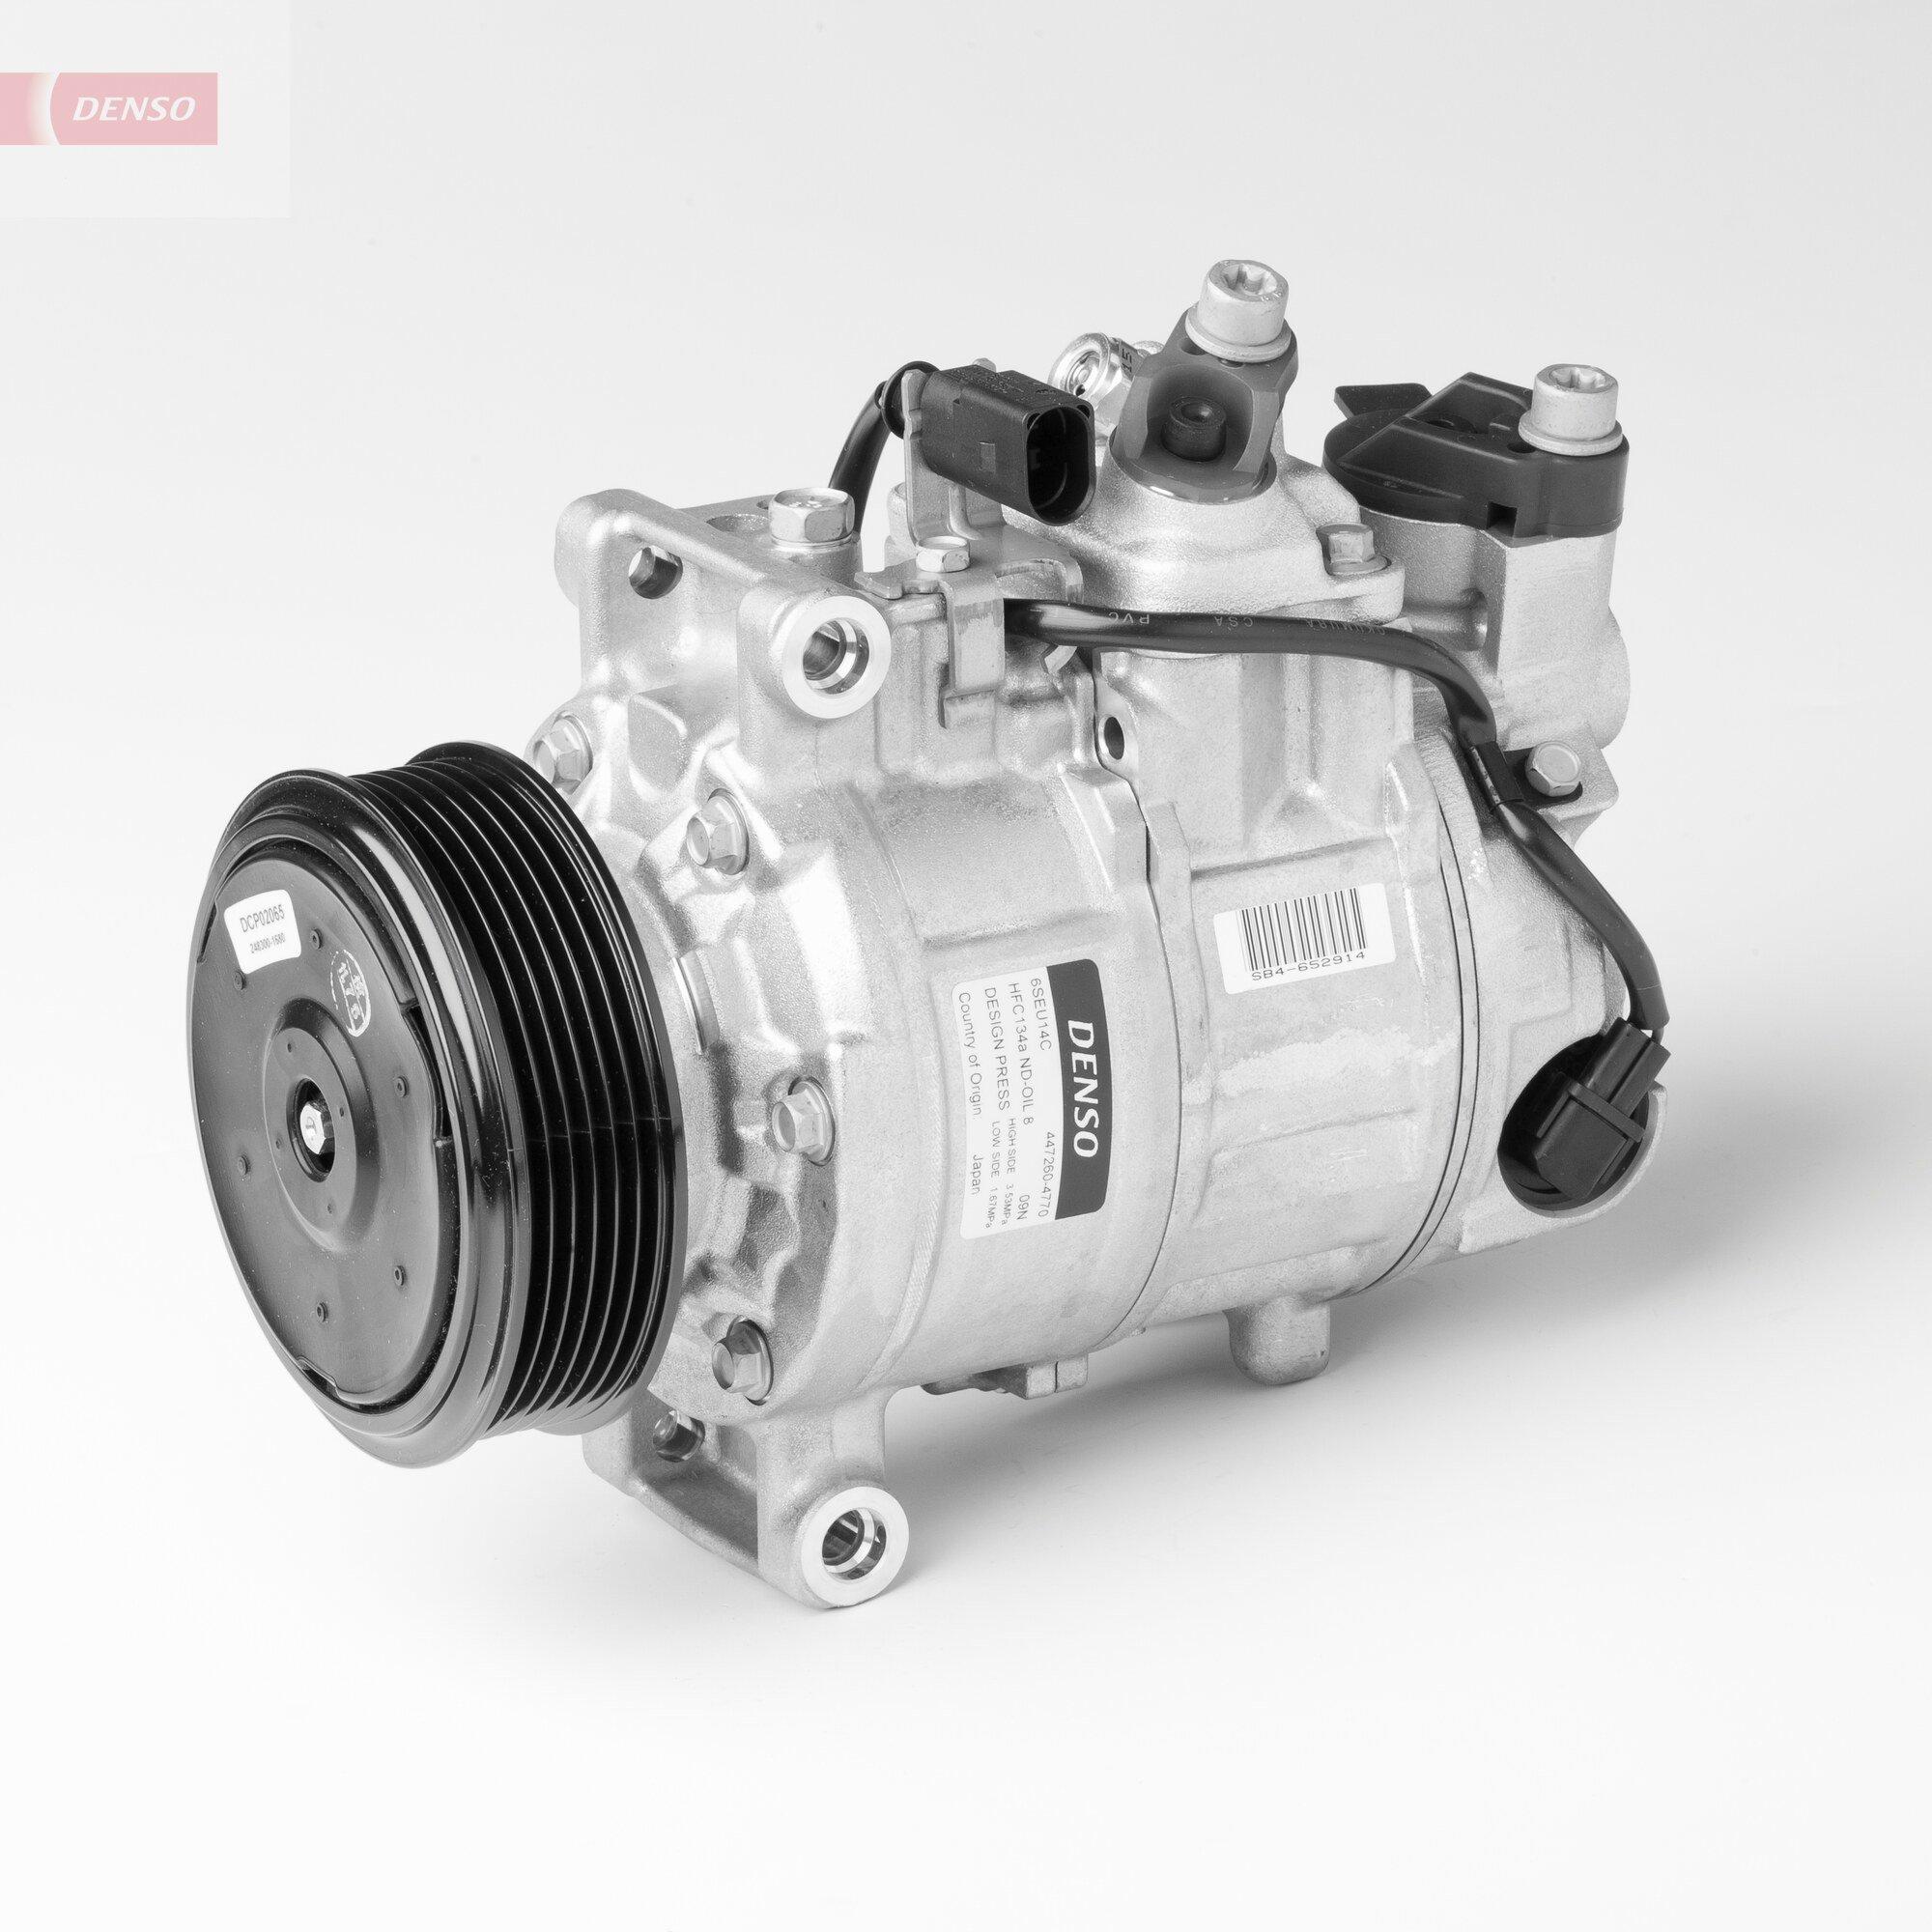 Kompressor, Klimaanlage DENSO DCP02065